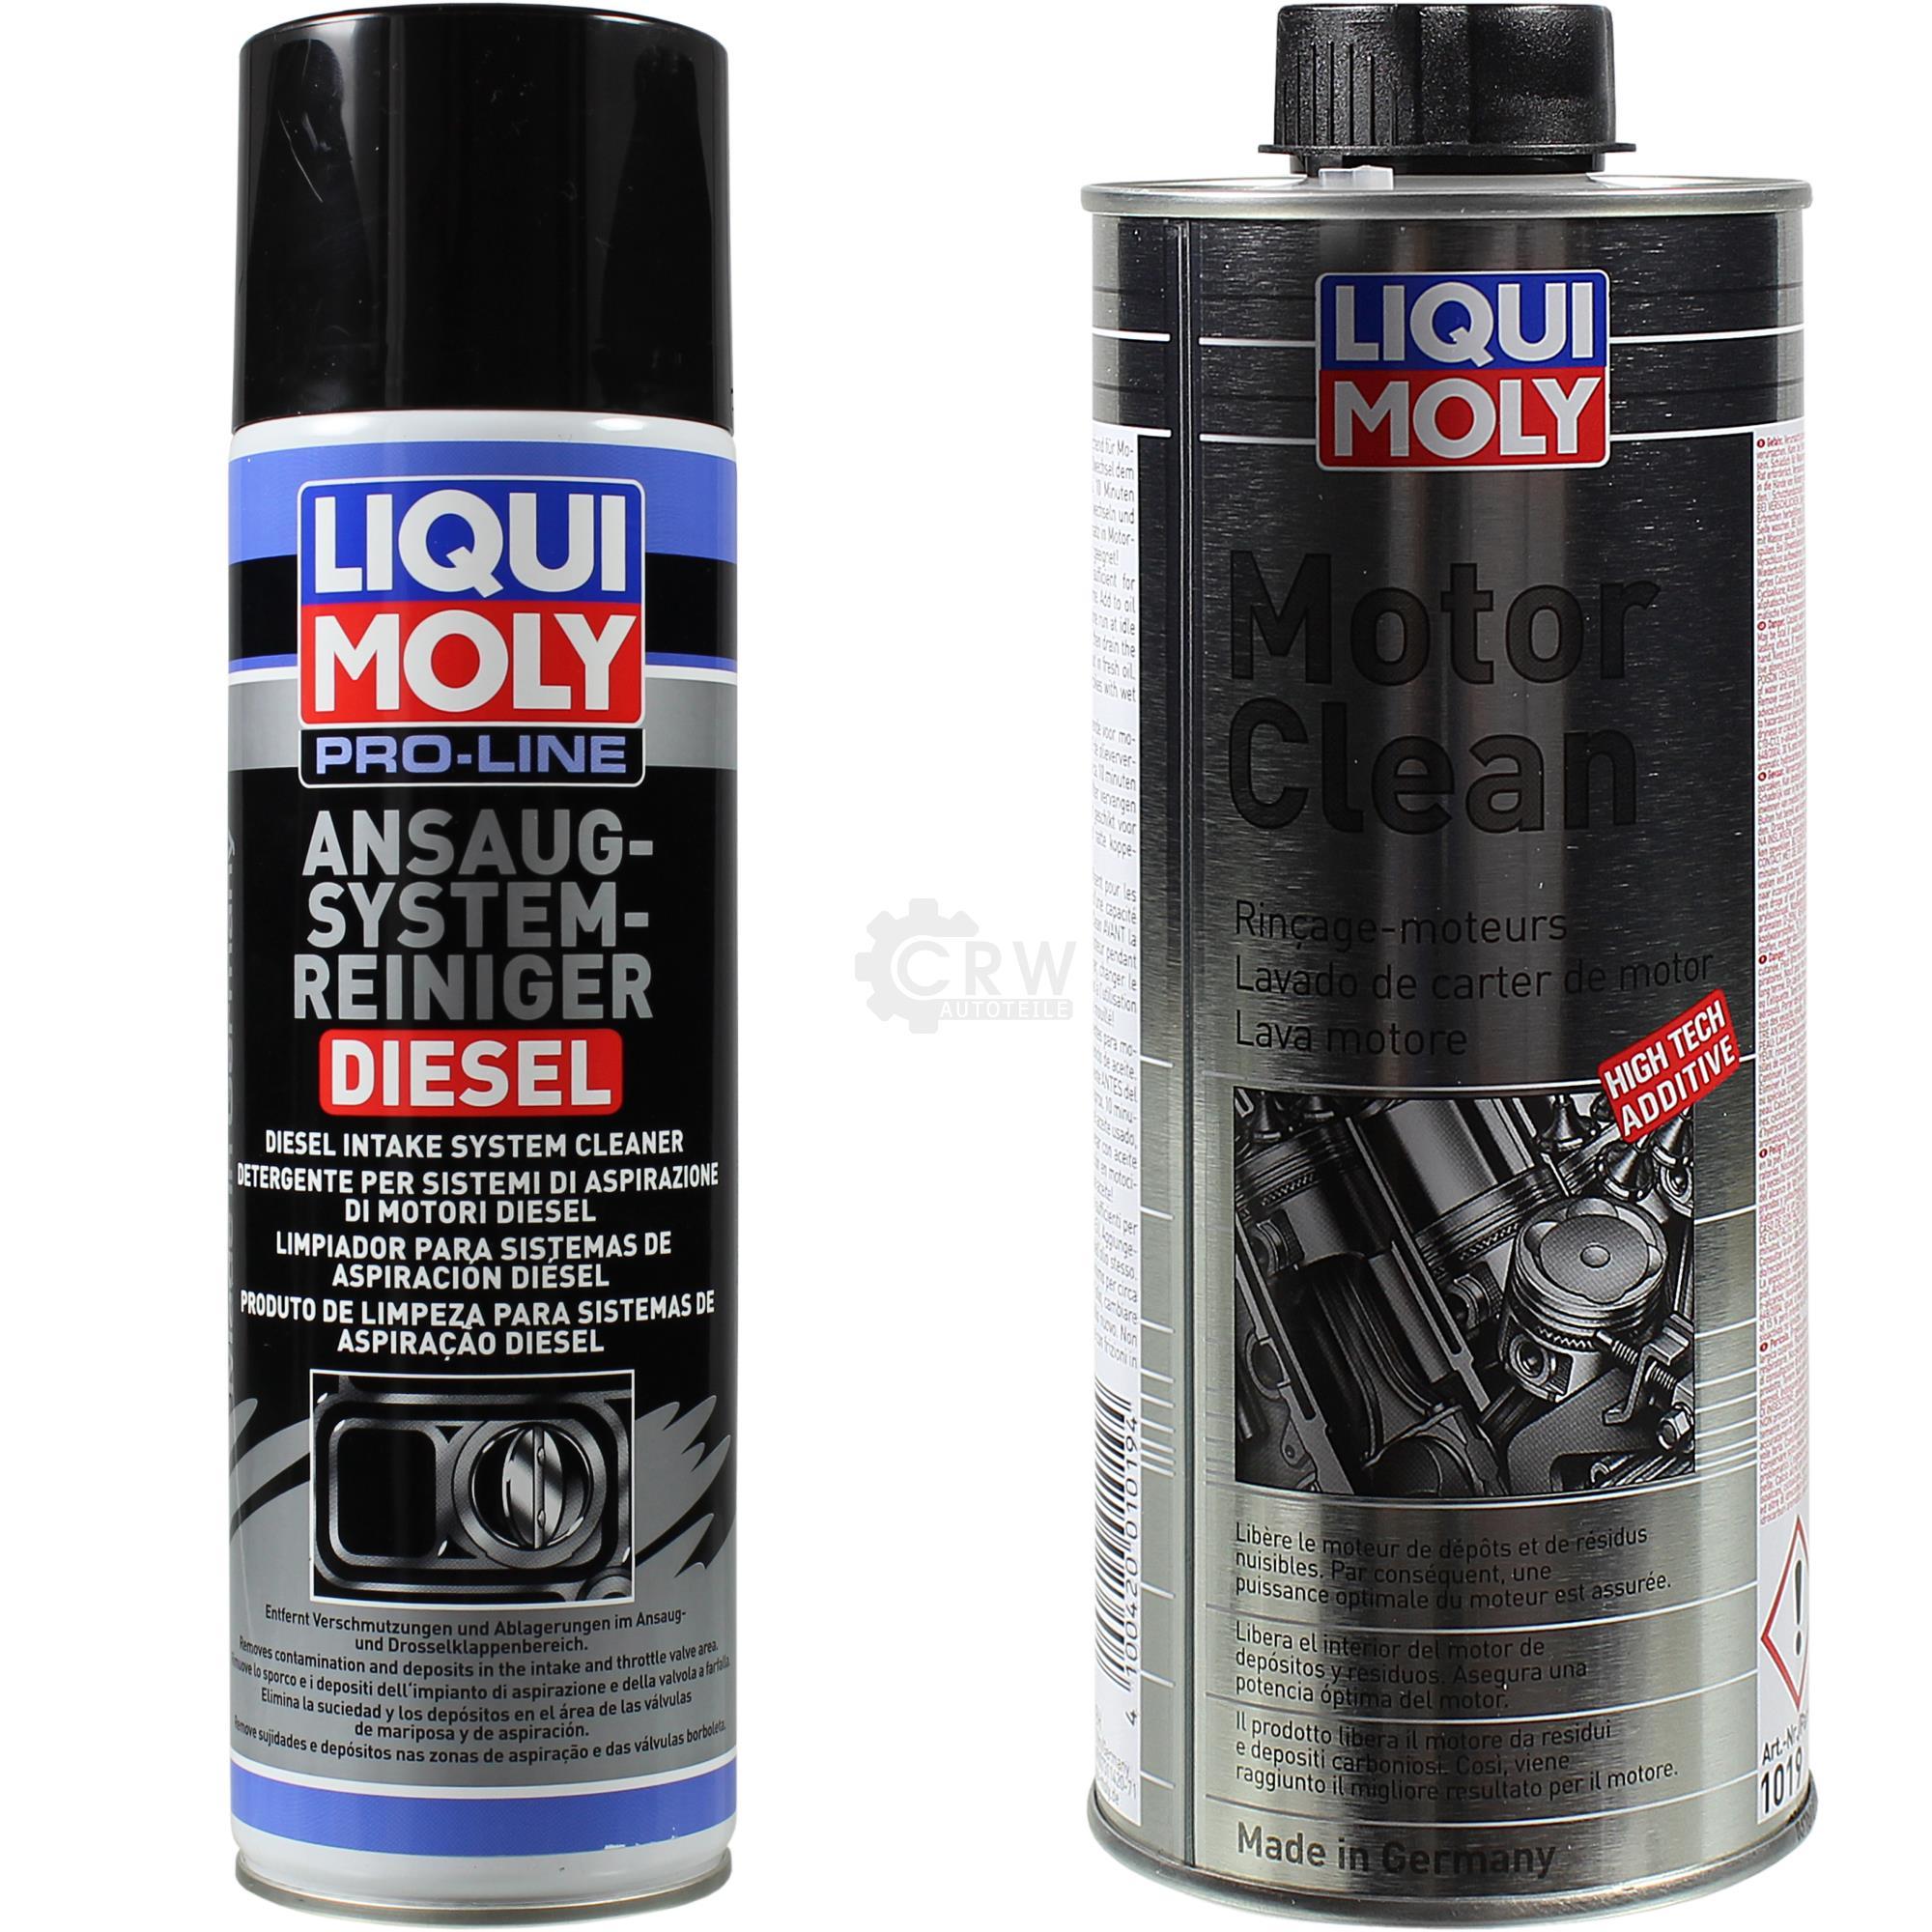 liqui moly set pro line ansaug system reiniger diesel und. Black Bedroom Furniture Sets. Home Design Ideas